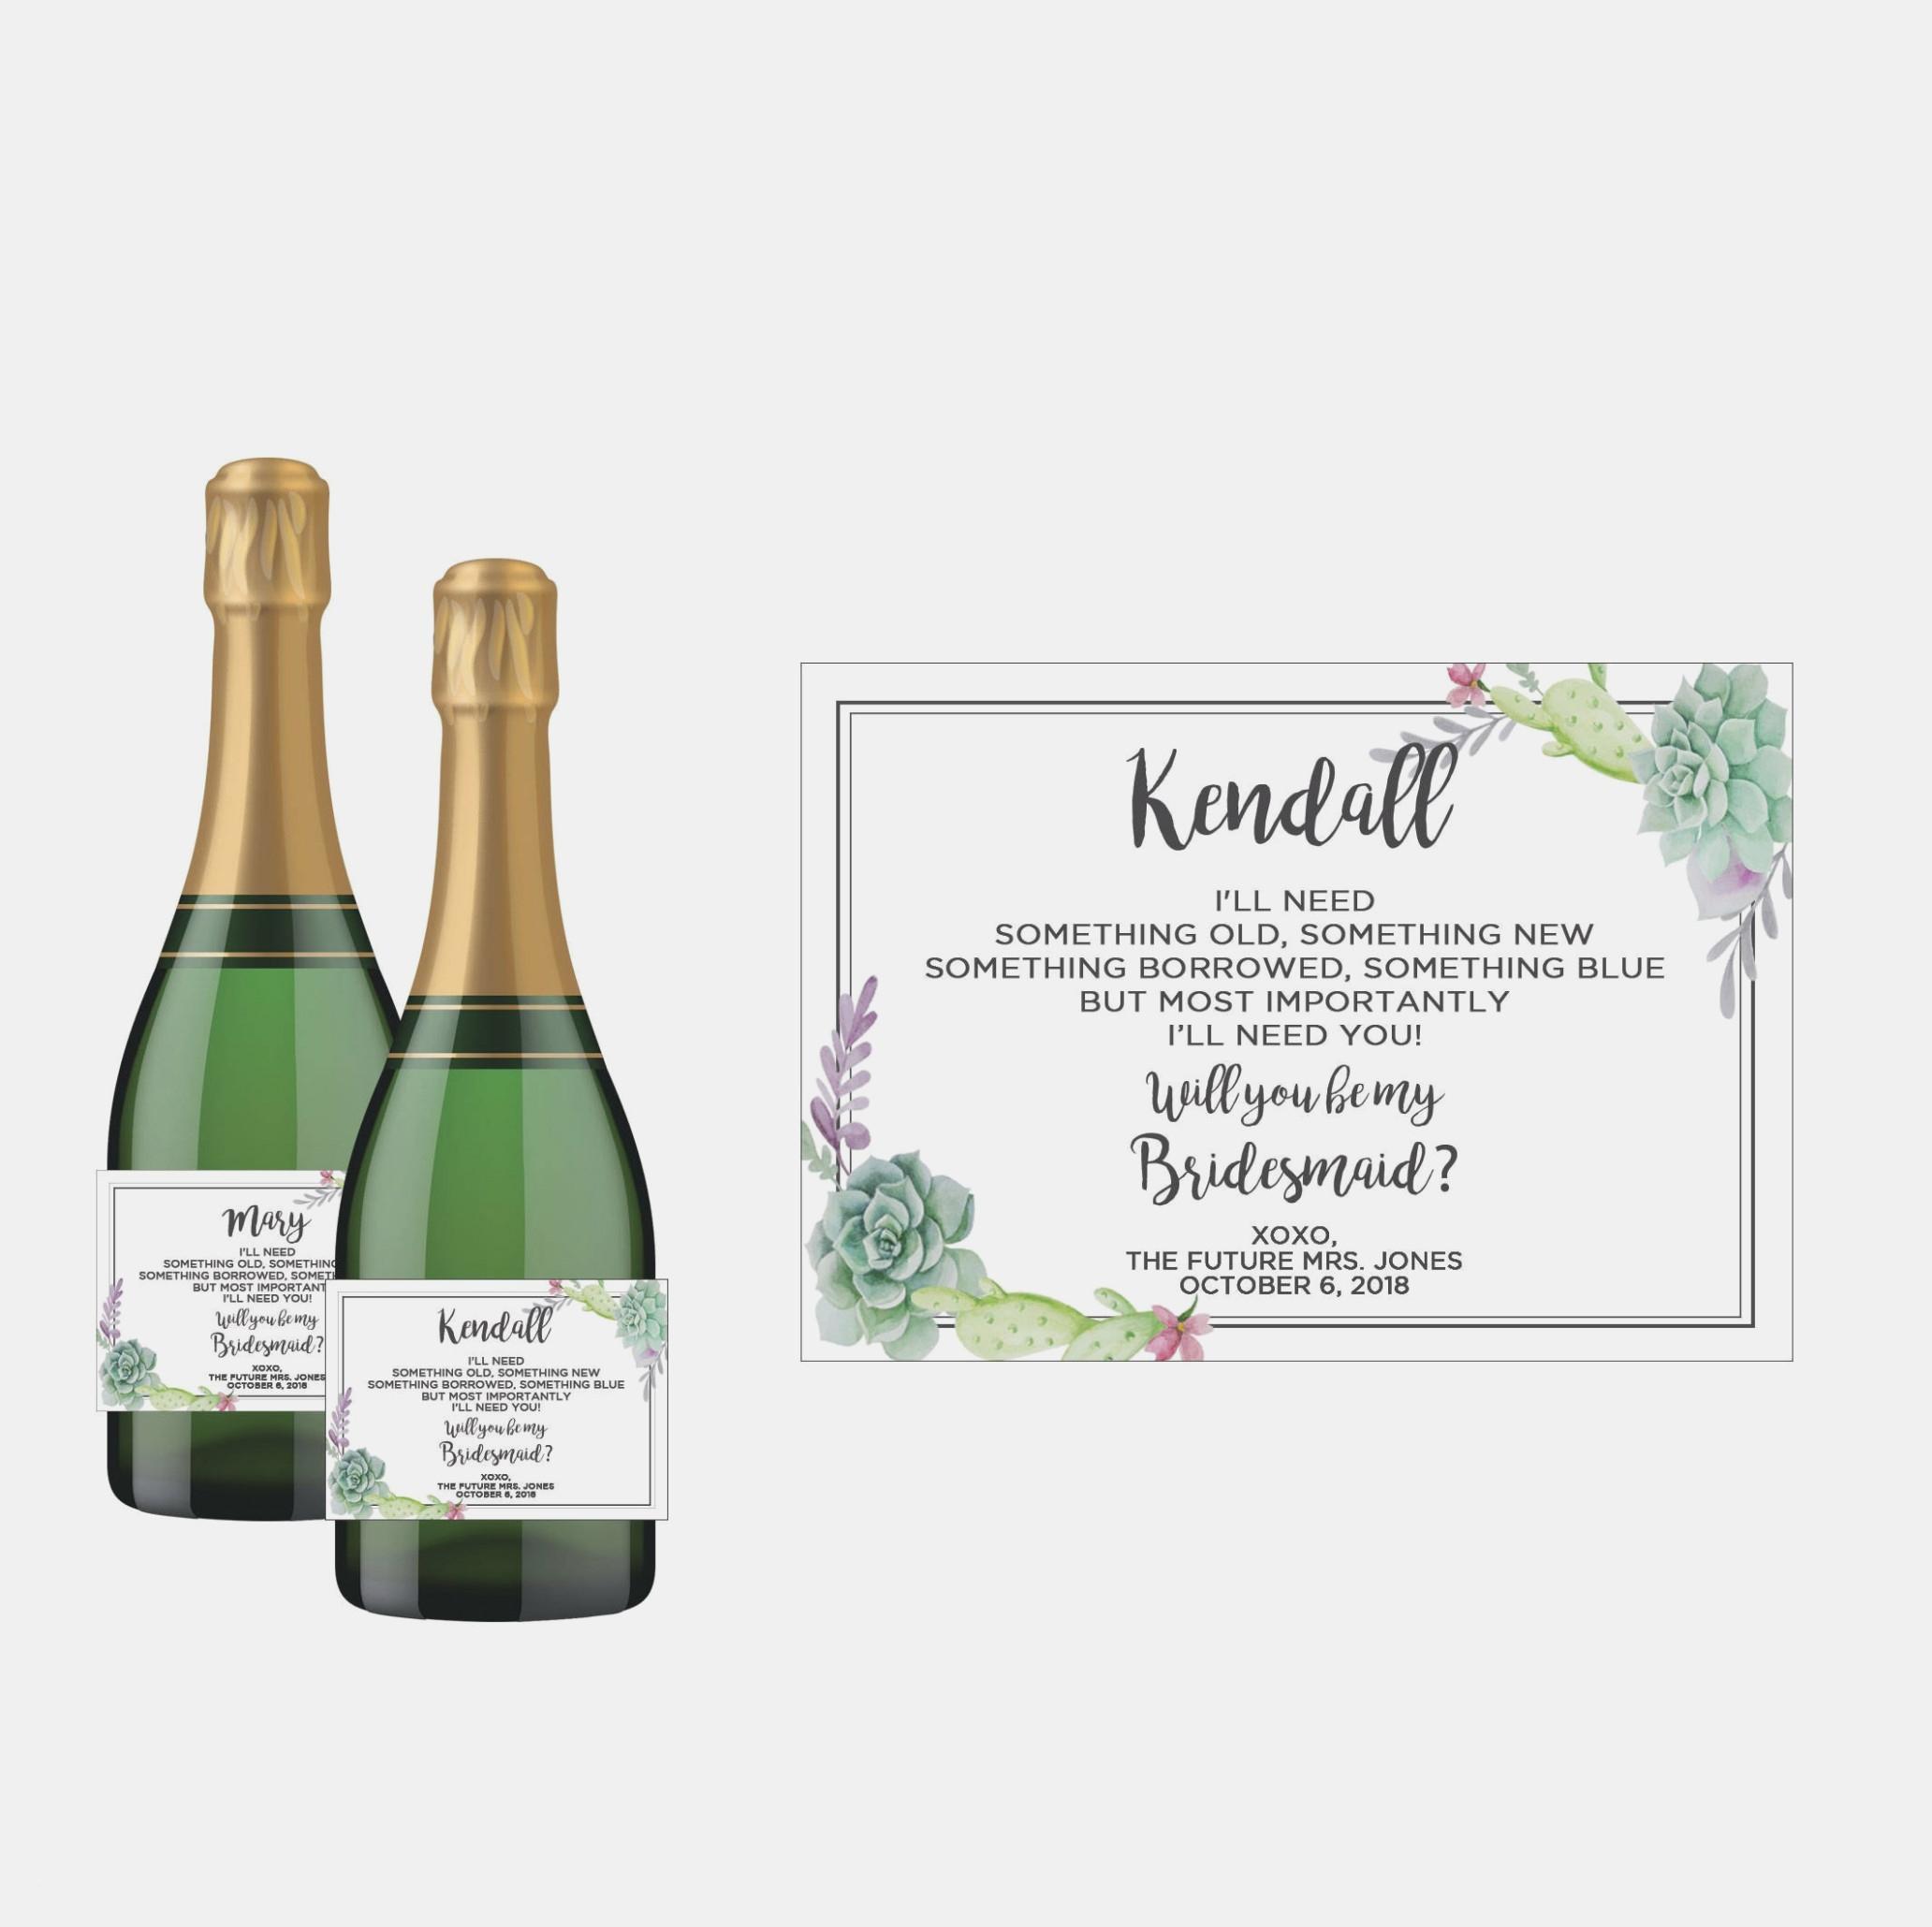 Free Printable Mini Champagne Bottle Labels 15 Brilliant Small Wine - Free Printable Mini Champagne Bottle Labels